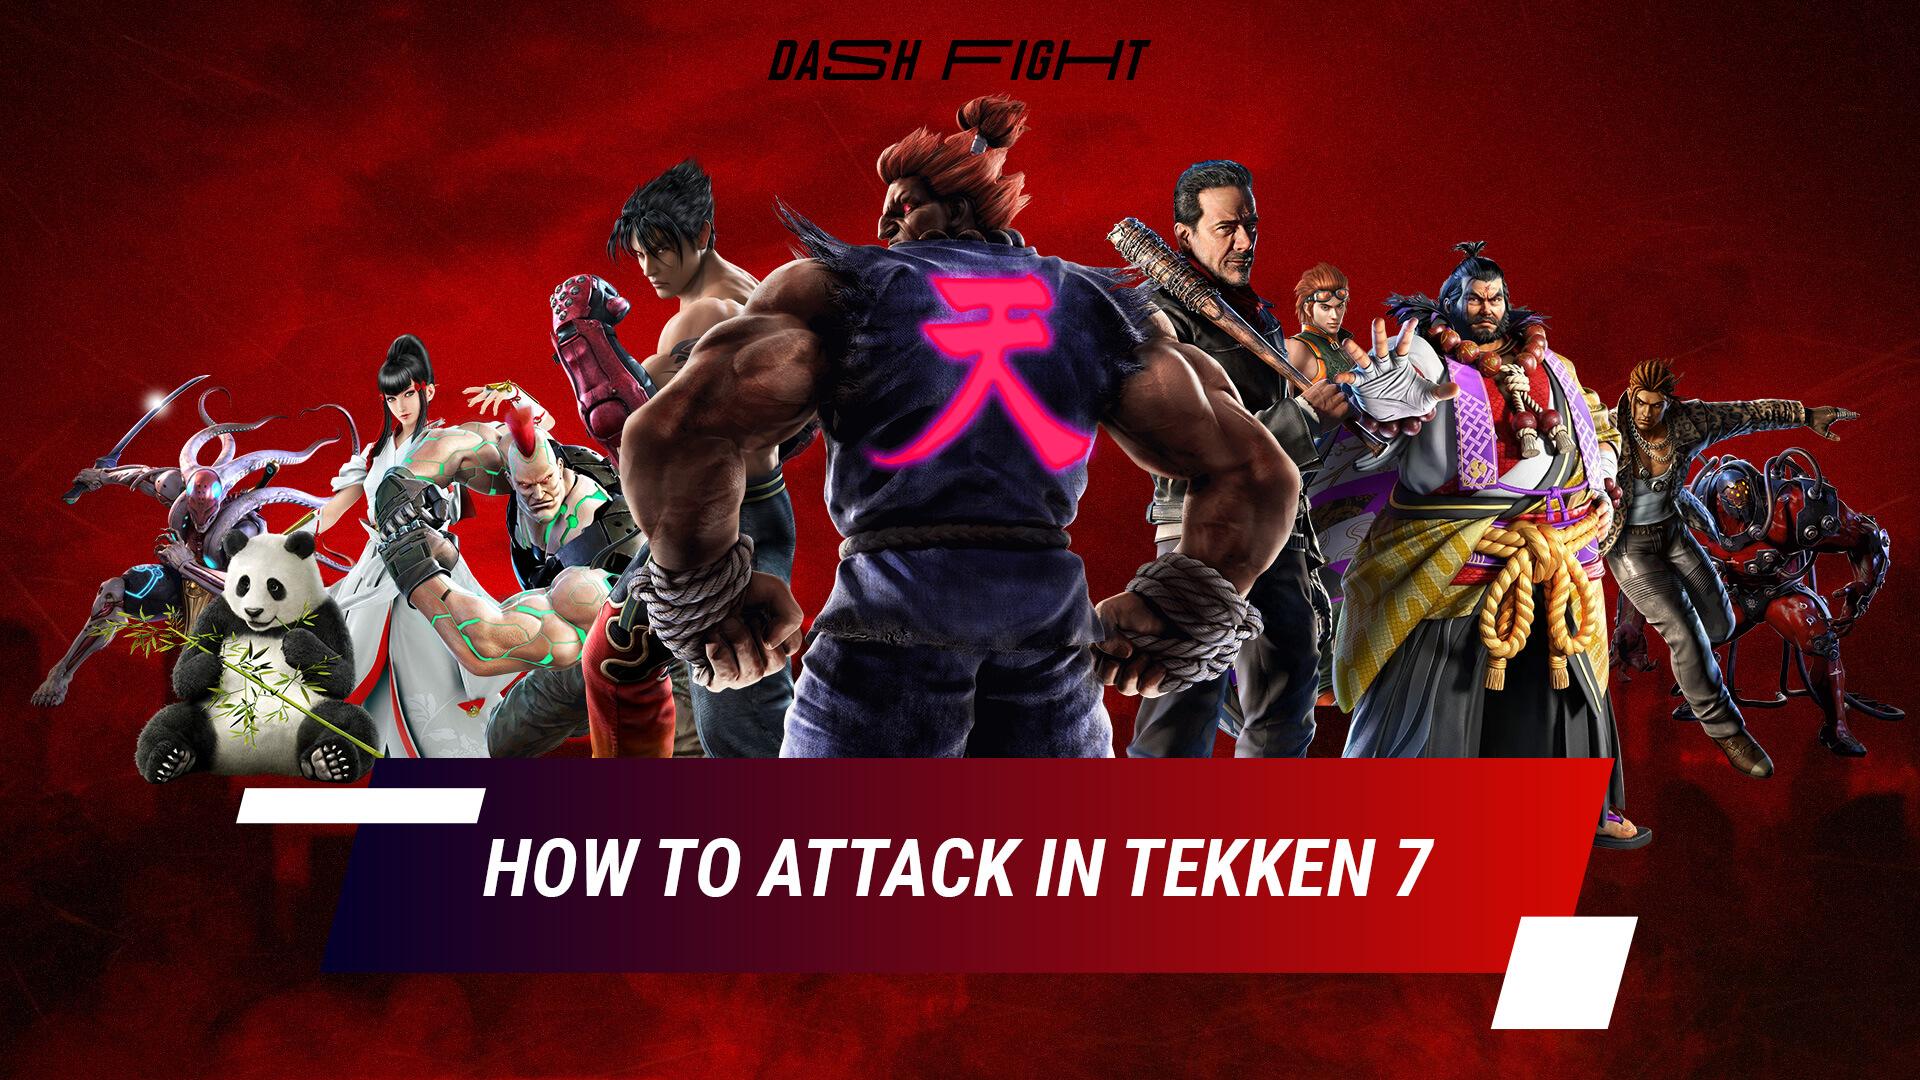 How to boost your attack in Tekken 7